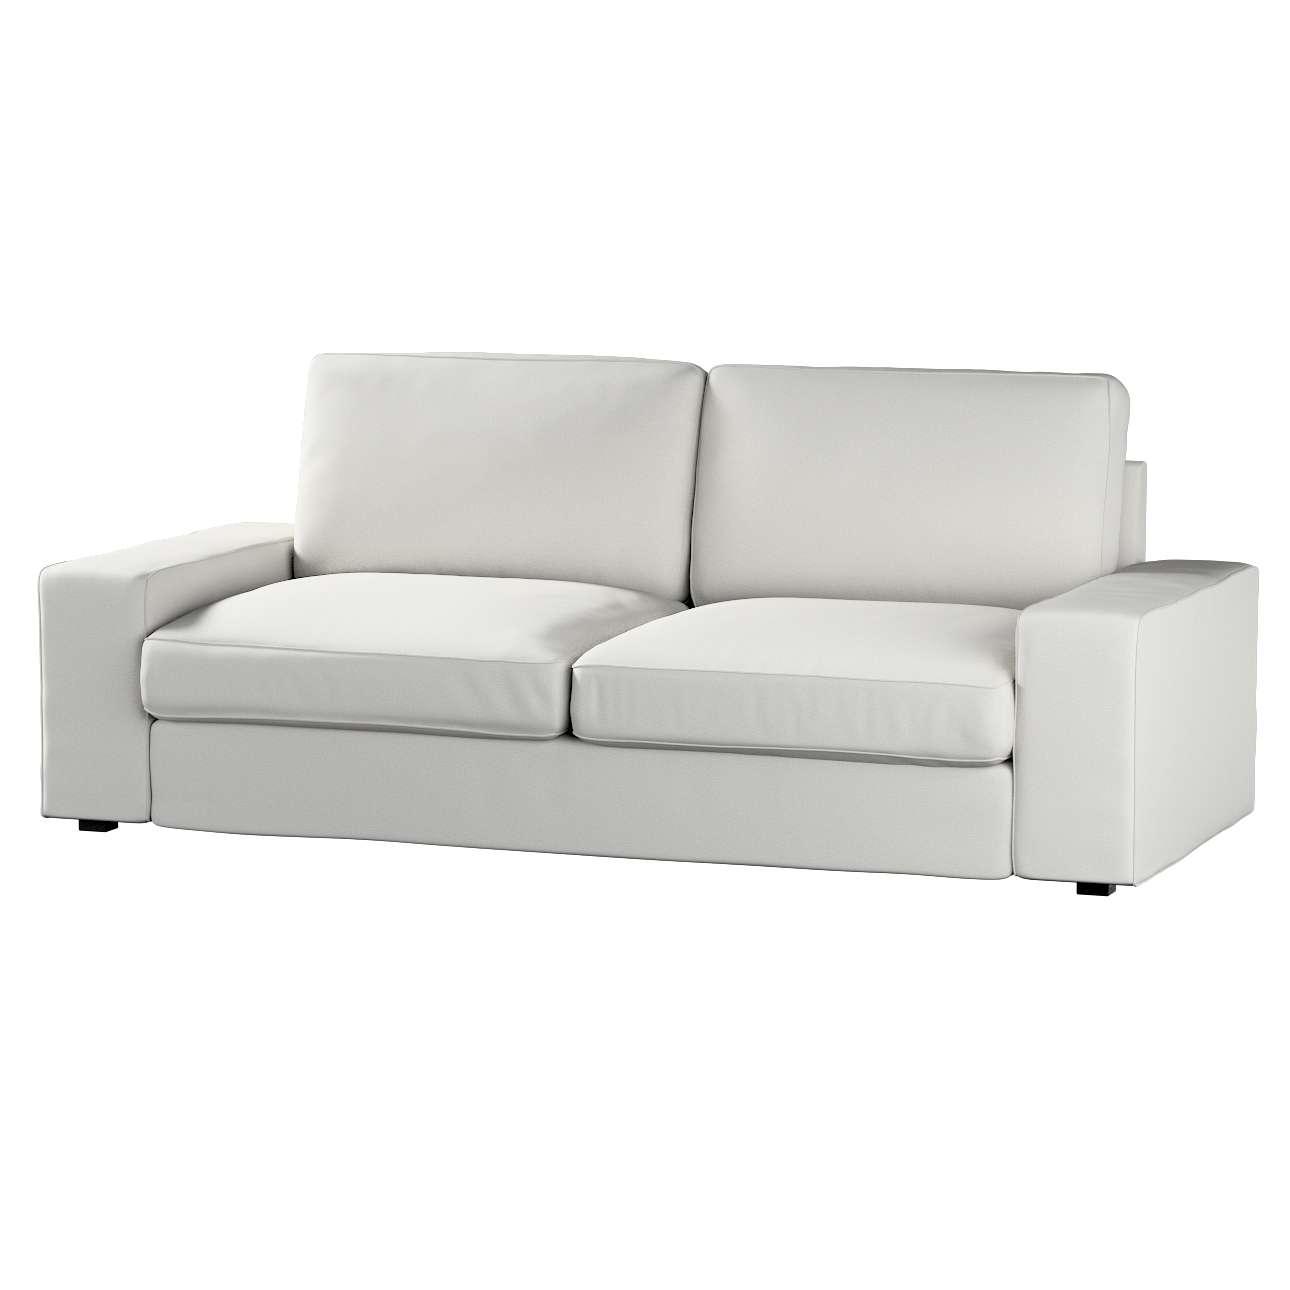 kivik 3 sitzer sofabezug hellgrau dekoria. Black Bedroom Furniture Sets. Home Design Ideas